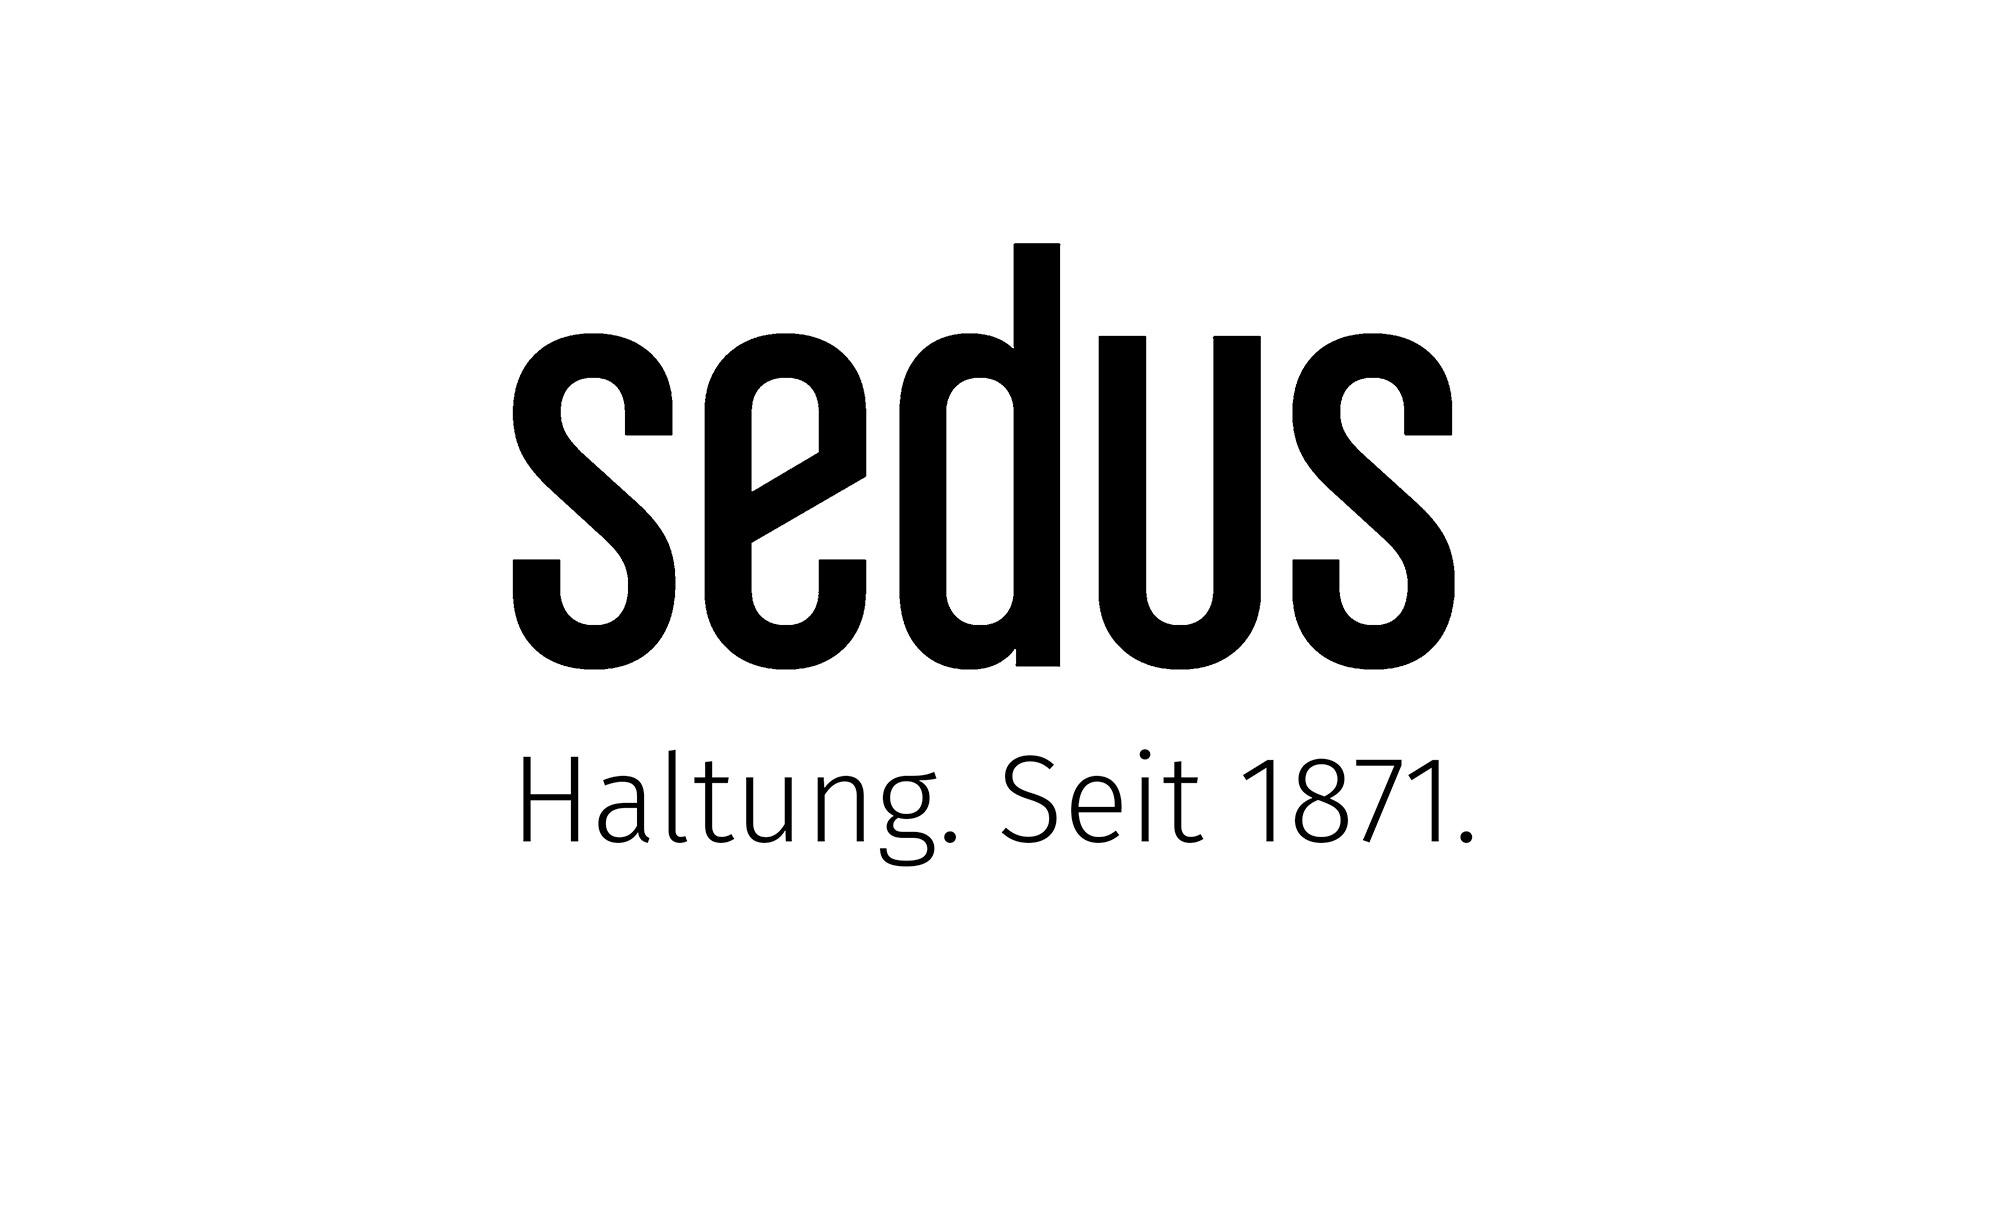 Logo Sedus – Haltung. Seit 1871.